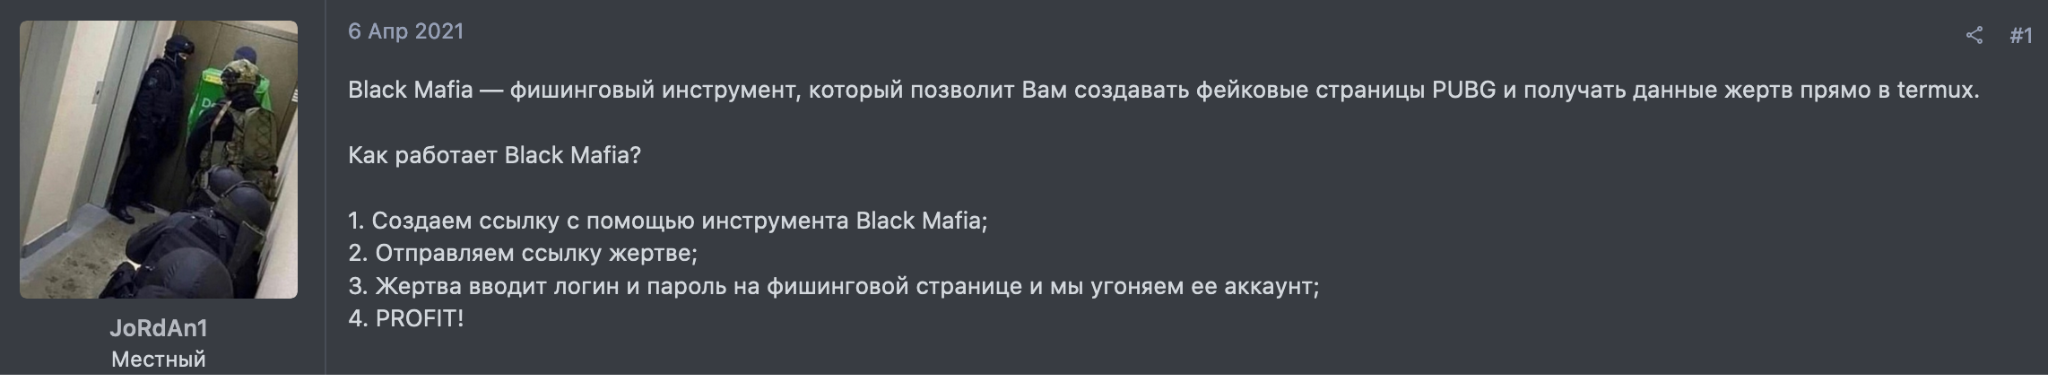 Cybercriminal sells BlackMafia phishing tool to create fake PUBG pages